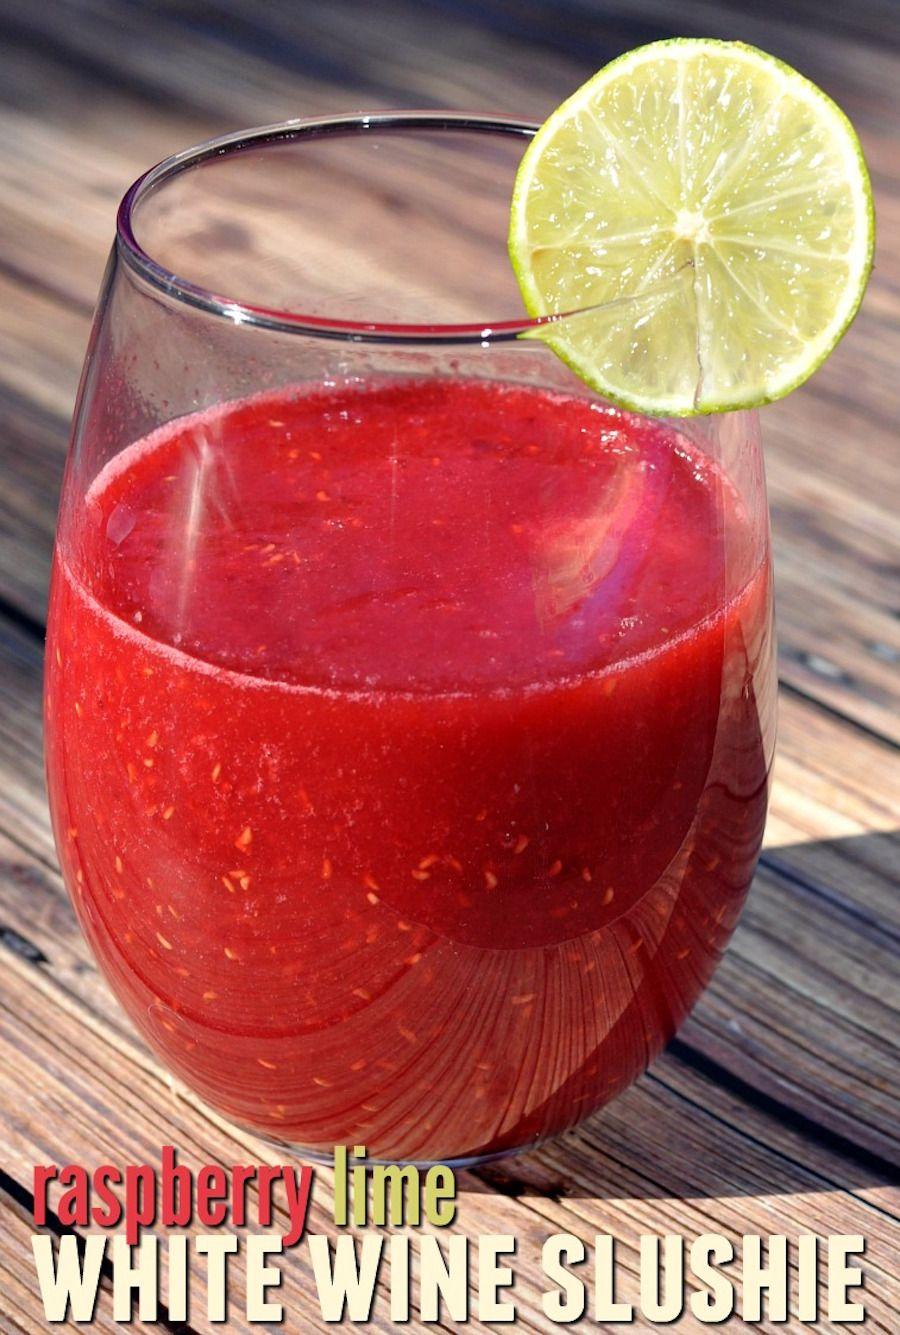 White Wine Slushie Recipes To Make Before The Summer Ends Wine Slushie Slushie Recipe Wine Slushie Recipe